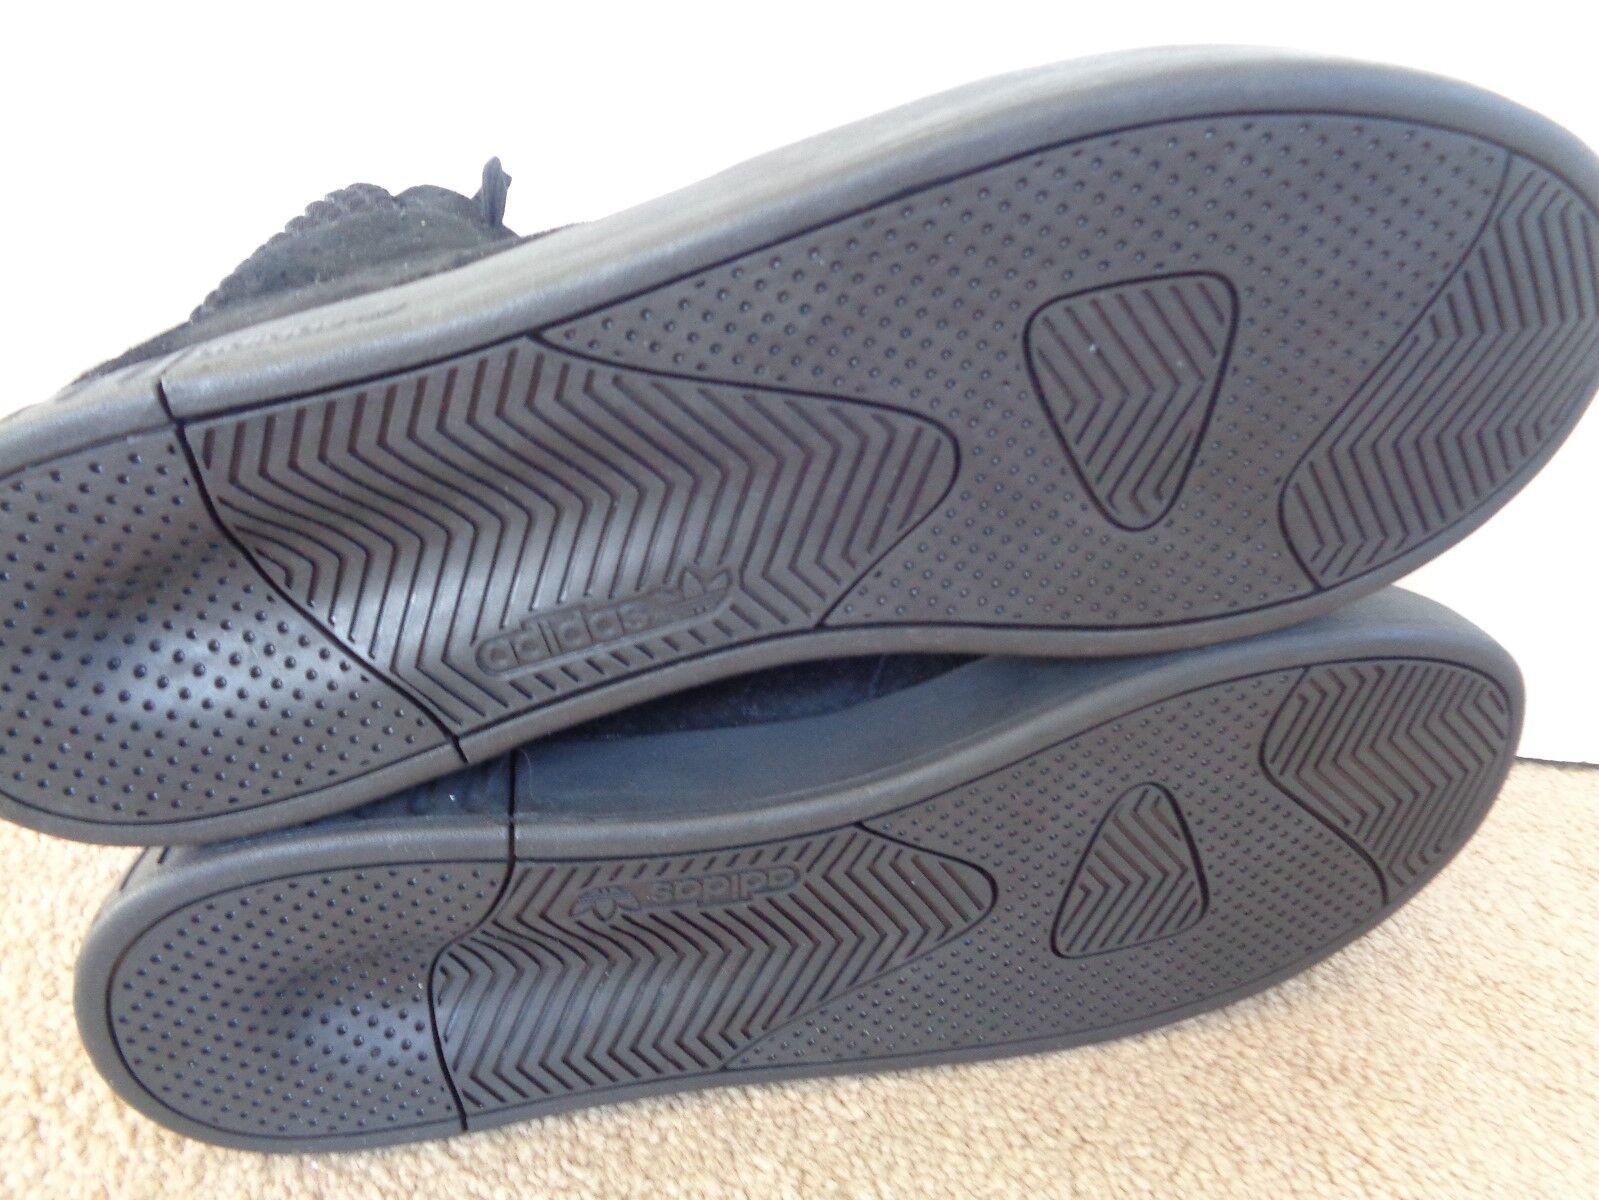 Adidas Tubular invader 2.0 trainers S80400 uk 10 eu 44 2/3 us 10.5 NEW+BOX